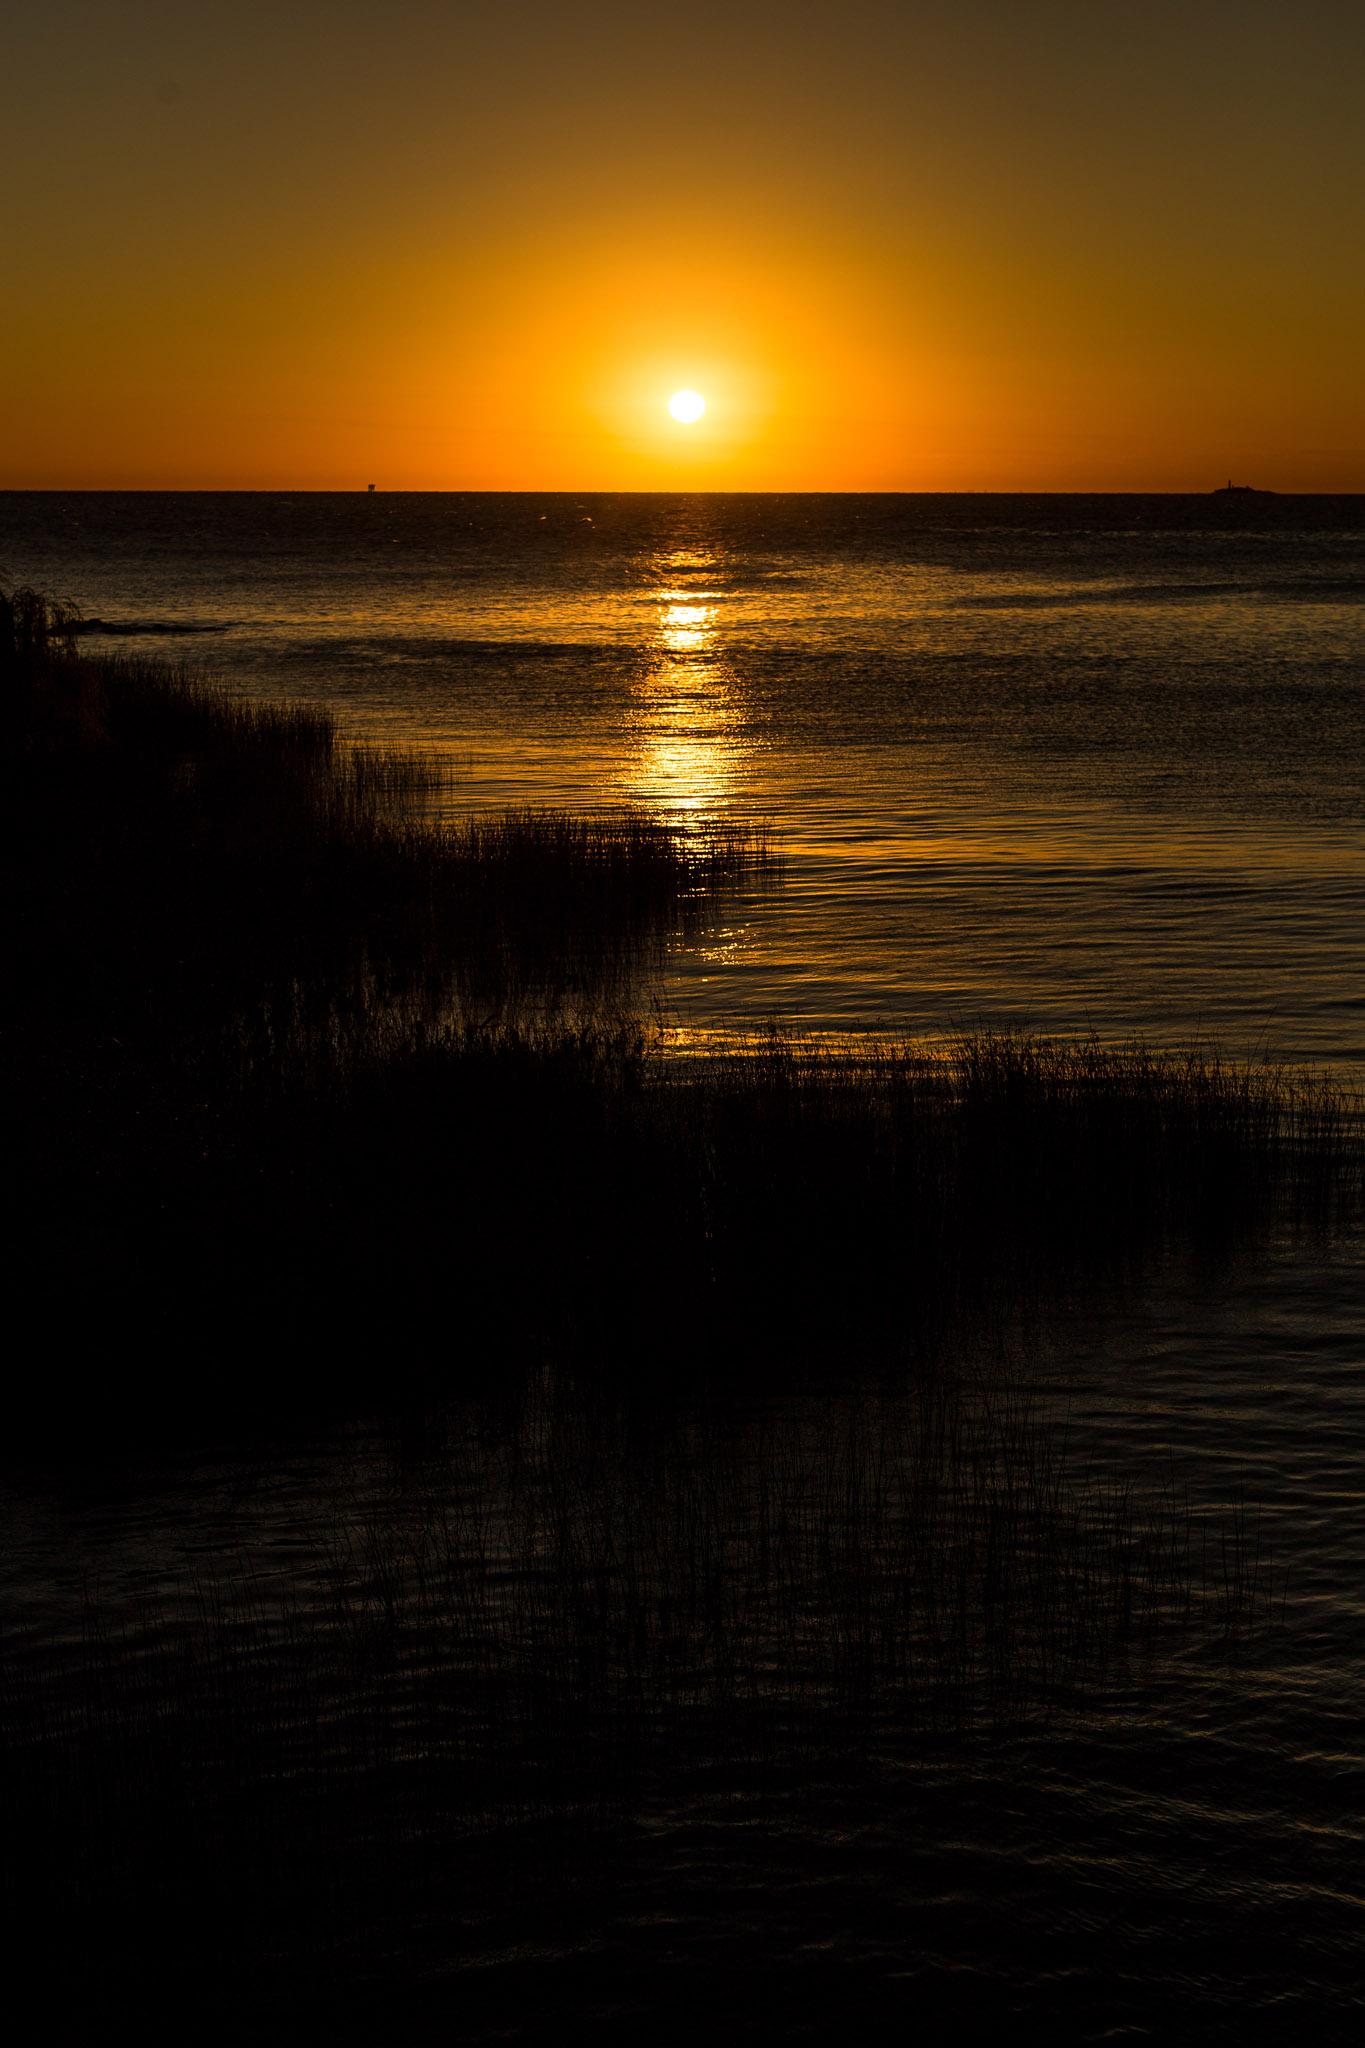 wedding-travellers-destination-photography-overlanding-south-america-uruguay-colonia-del-sacramento-sunset-river-sea